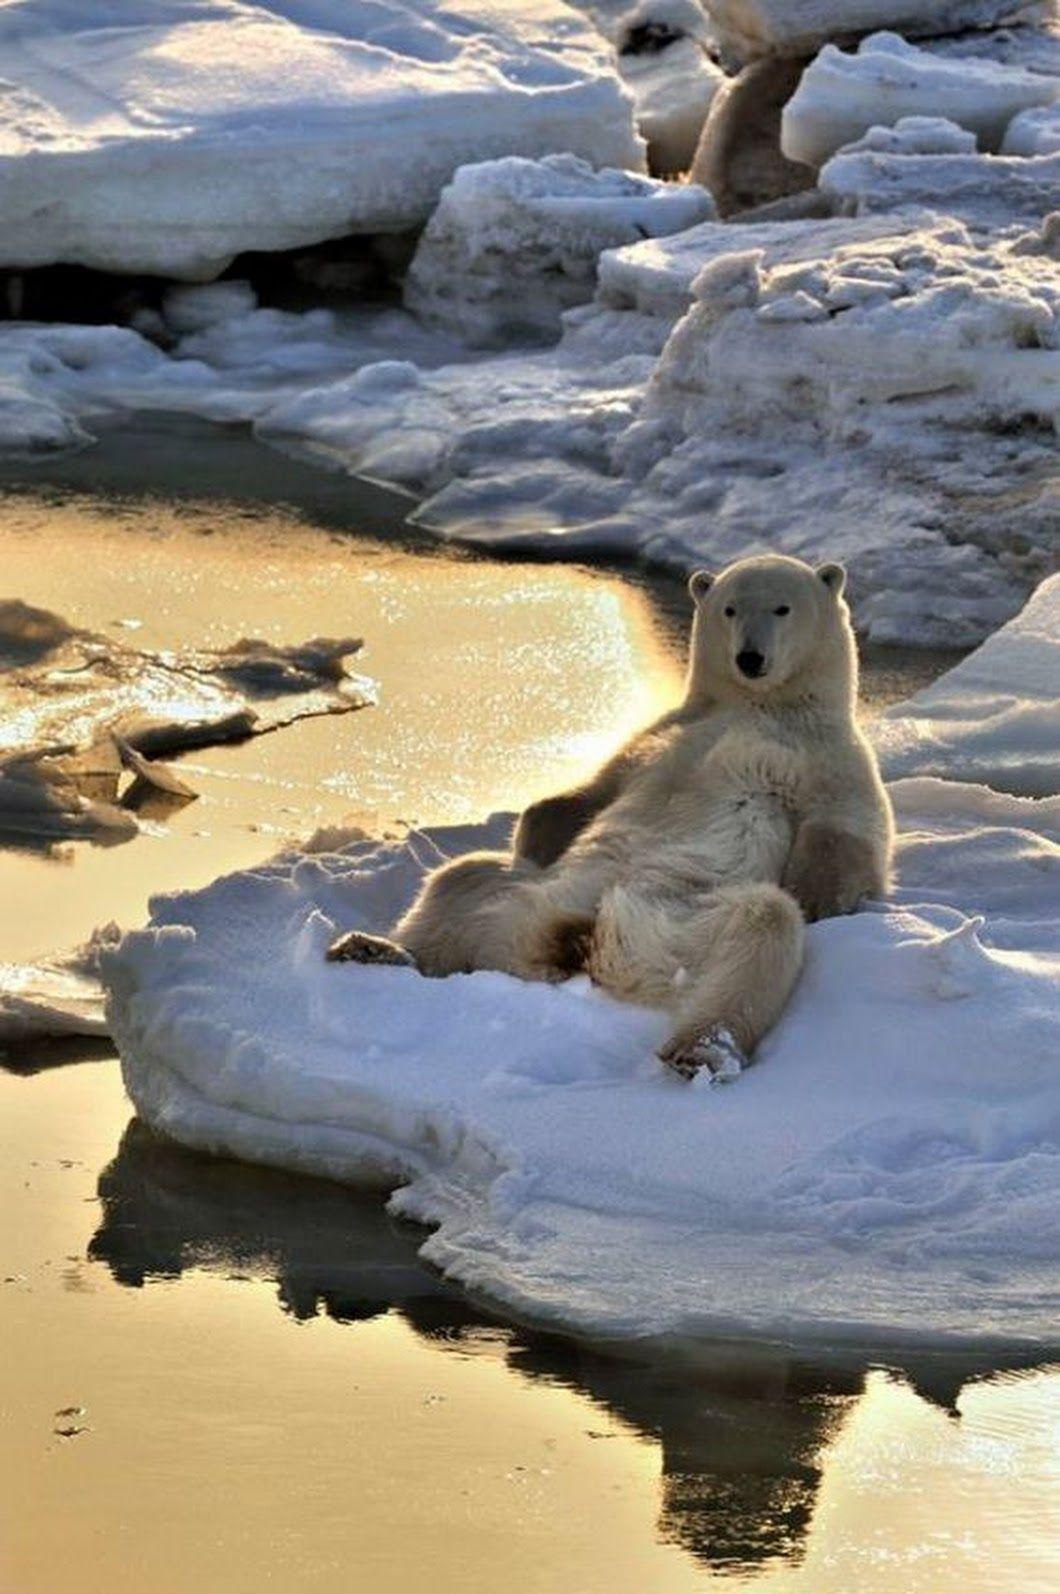 Man Spreader Polar Bear Casually Comfortable And Not At